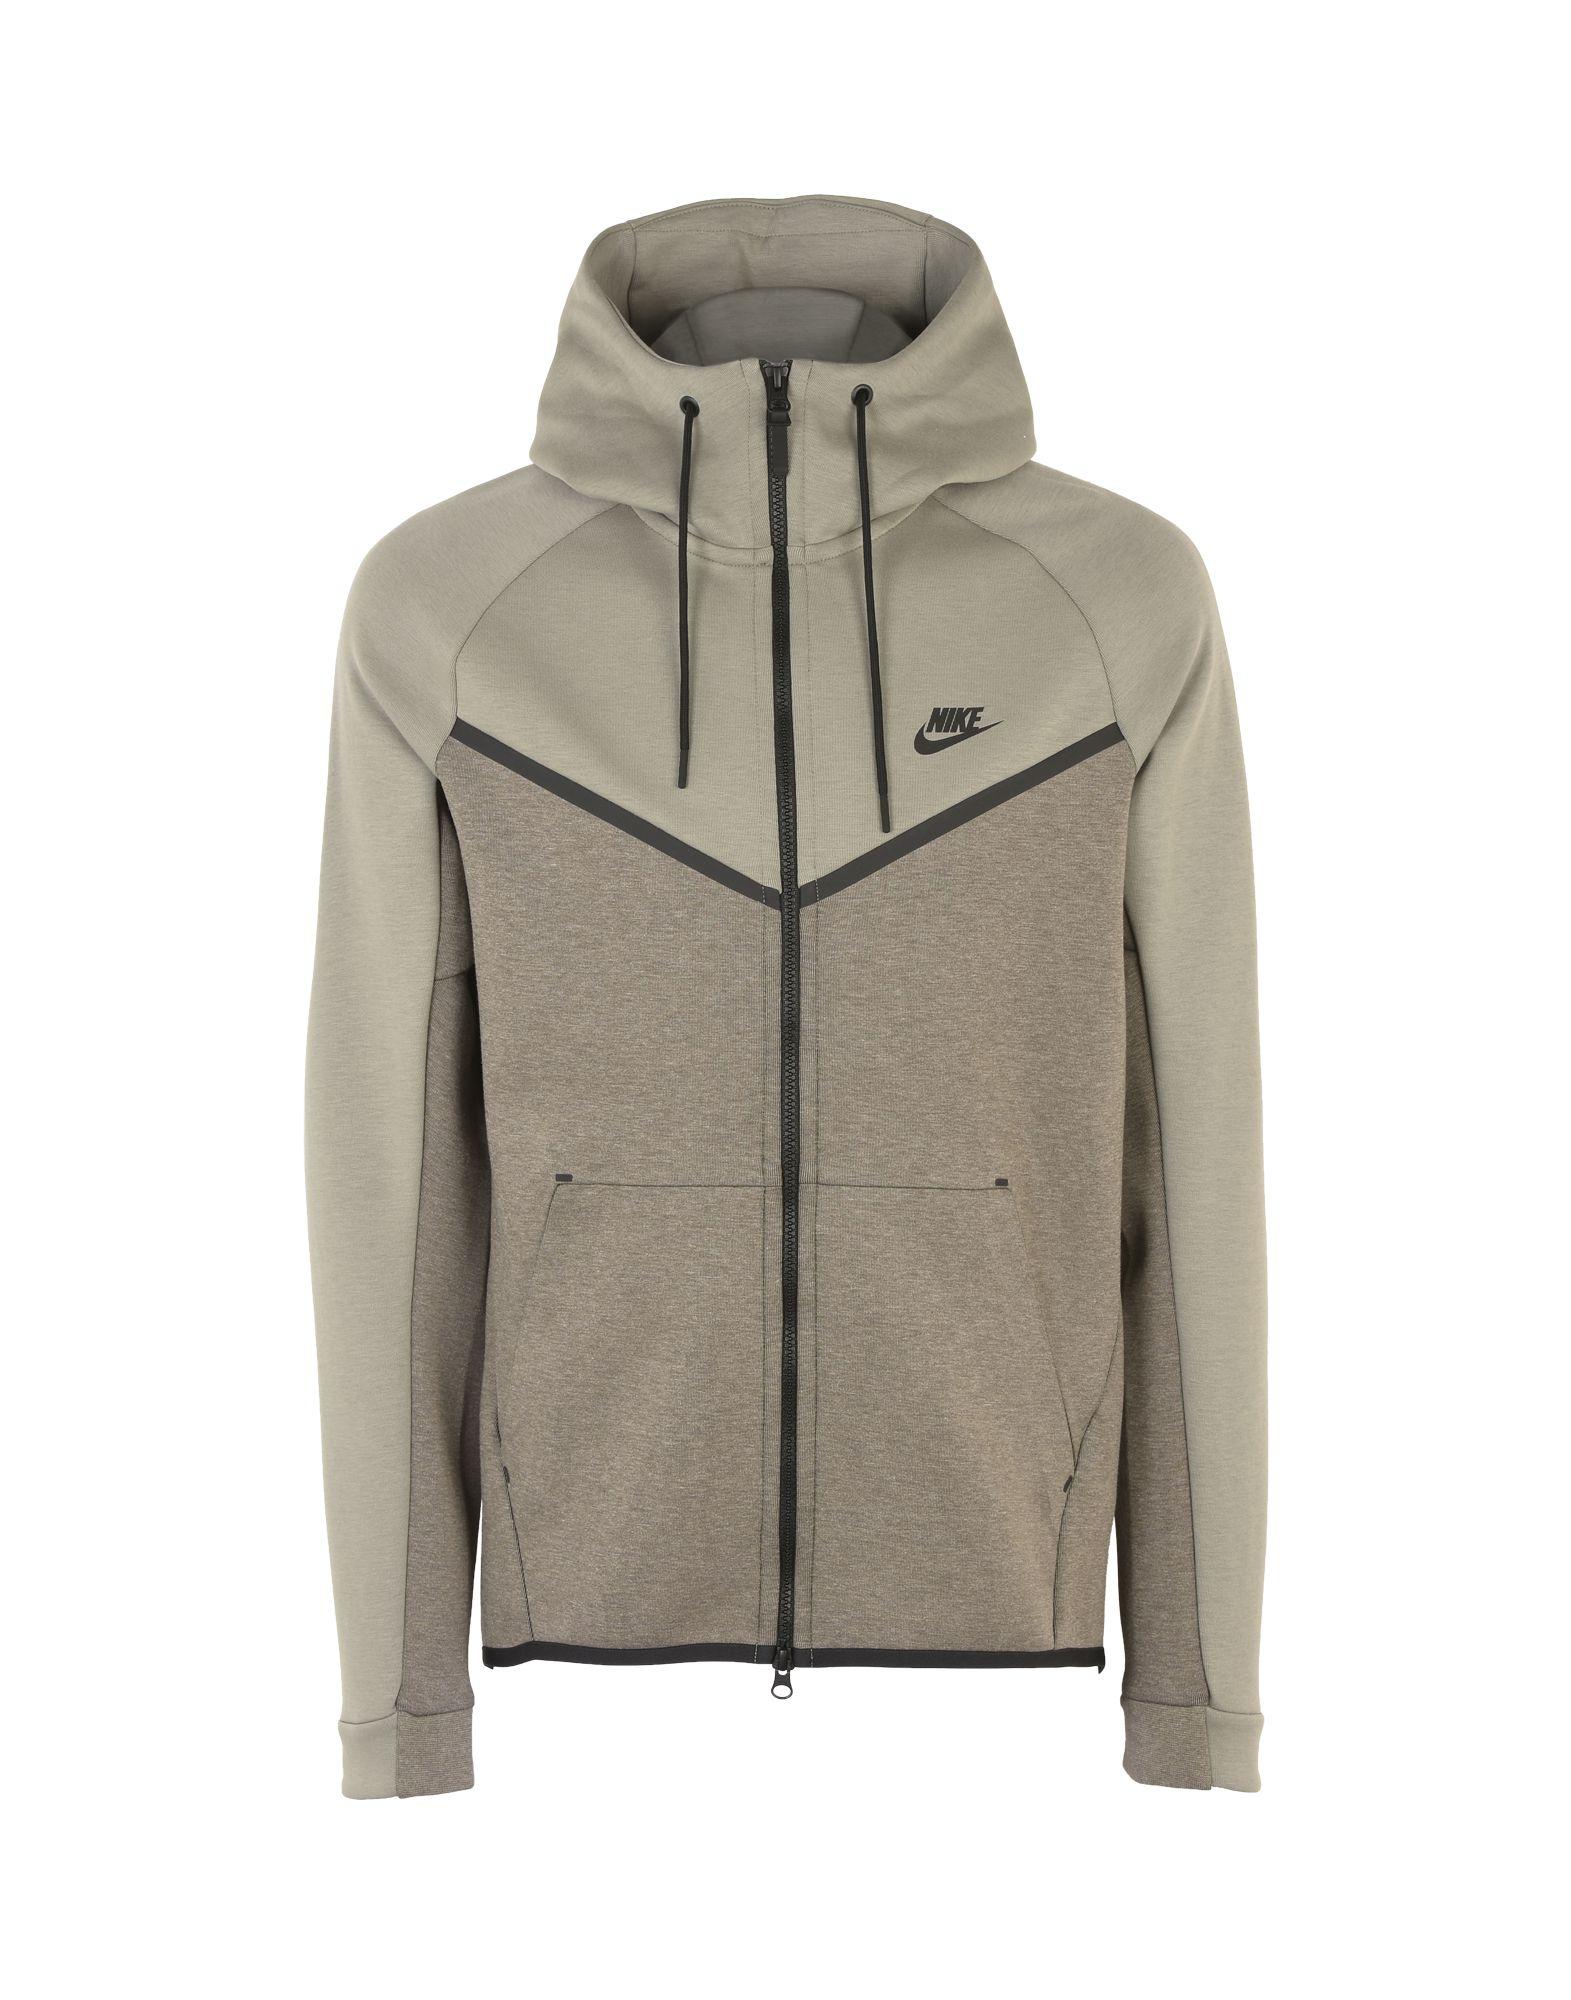 Felpa Nike Tech Fleece  Hoodie Full Zip - Uomo - Acquista online su